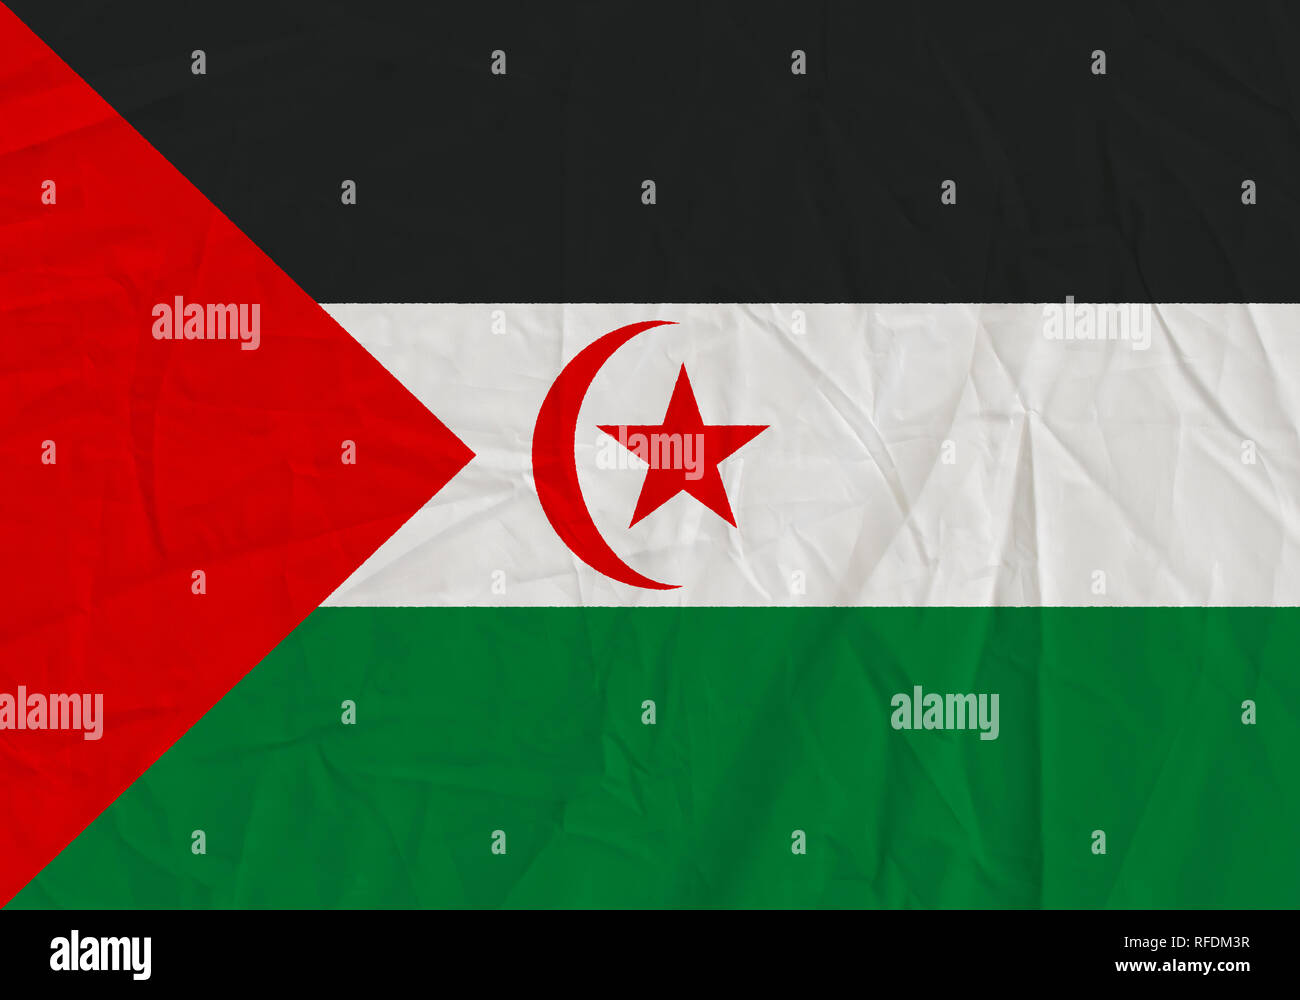 Sahrawi Arab Democratic Republic grunge flag. Patriotic background. National flag of Sahrawi Arab Democratic Republic - Stock Image